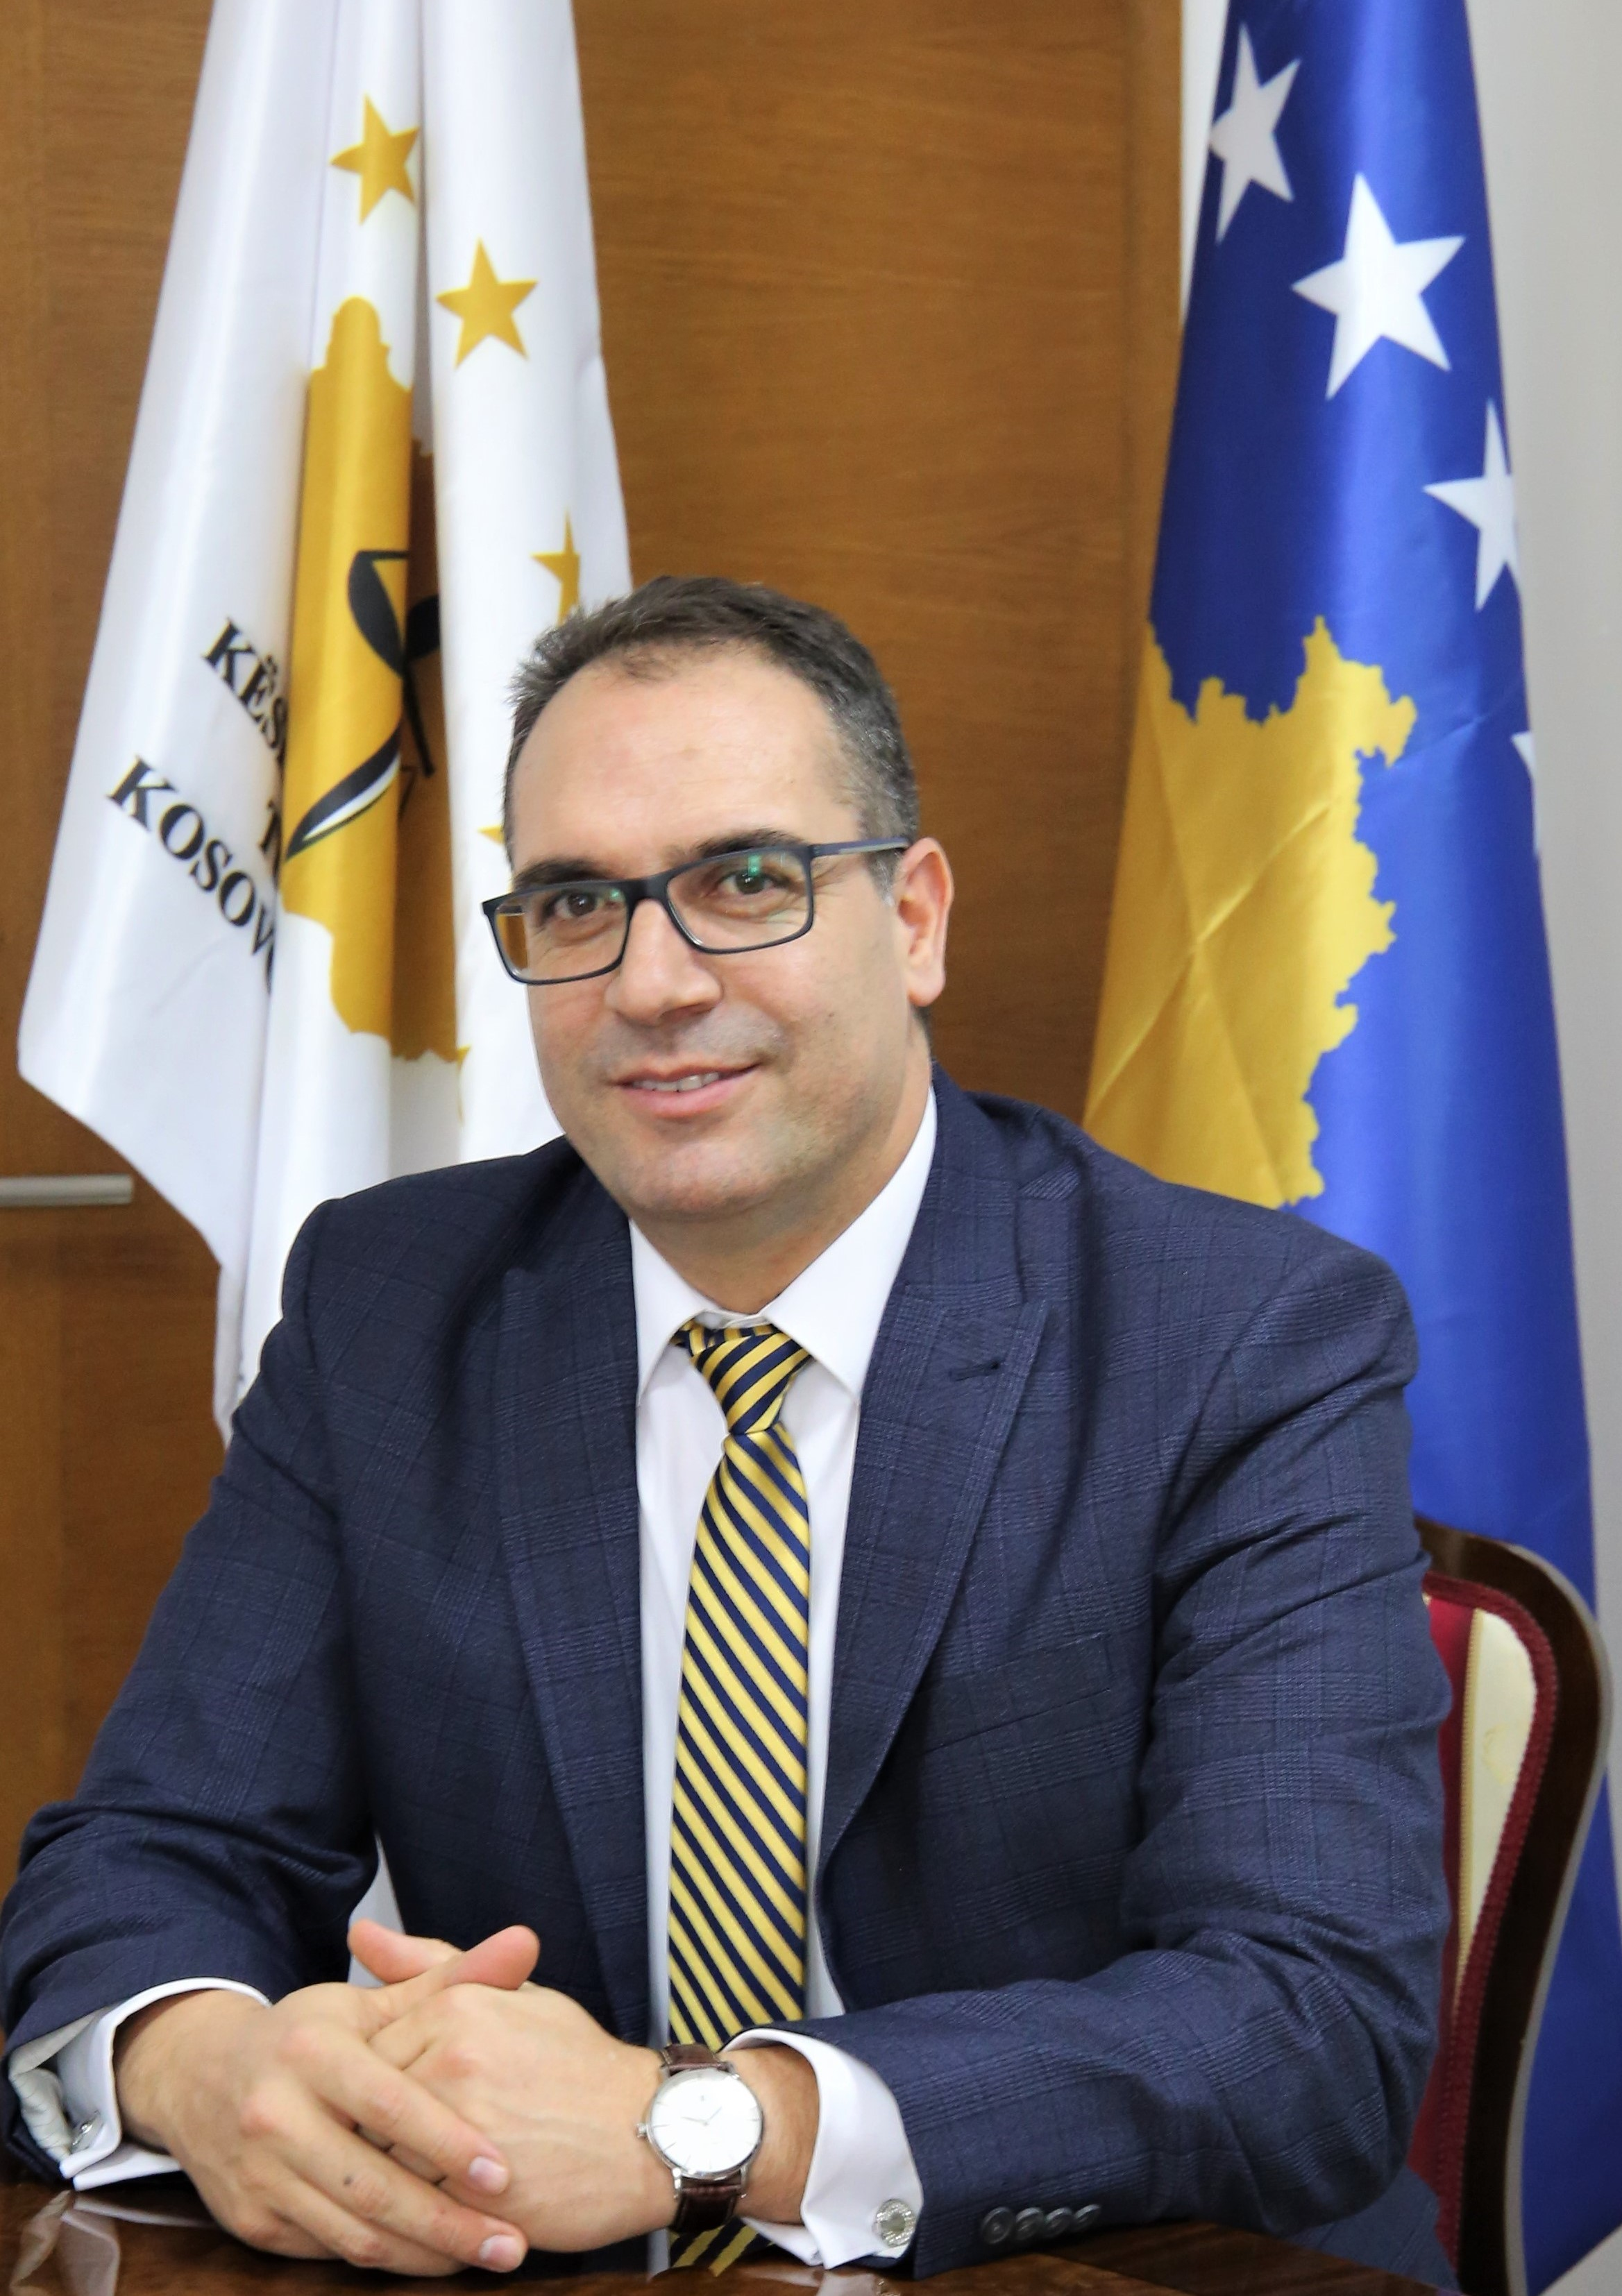 Sistemi Prokurorial I Republikes Se Kosoves